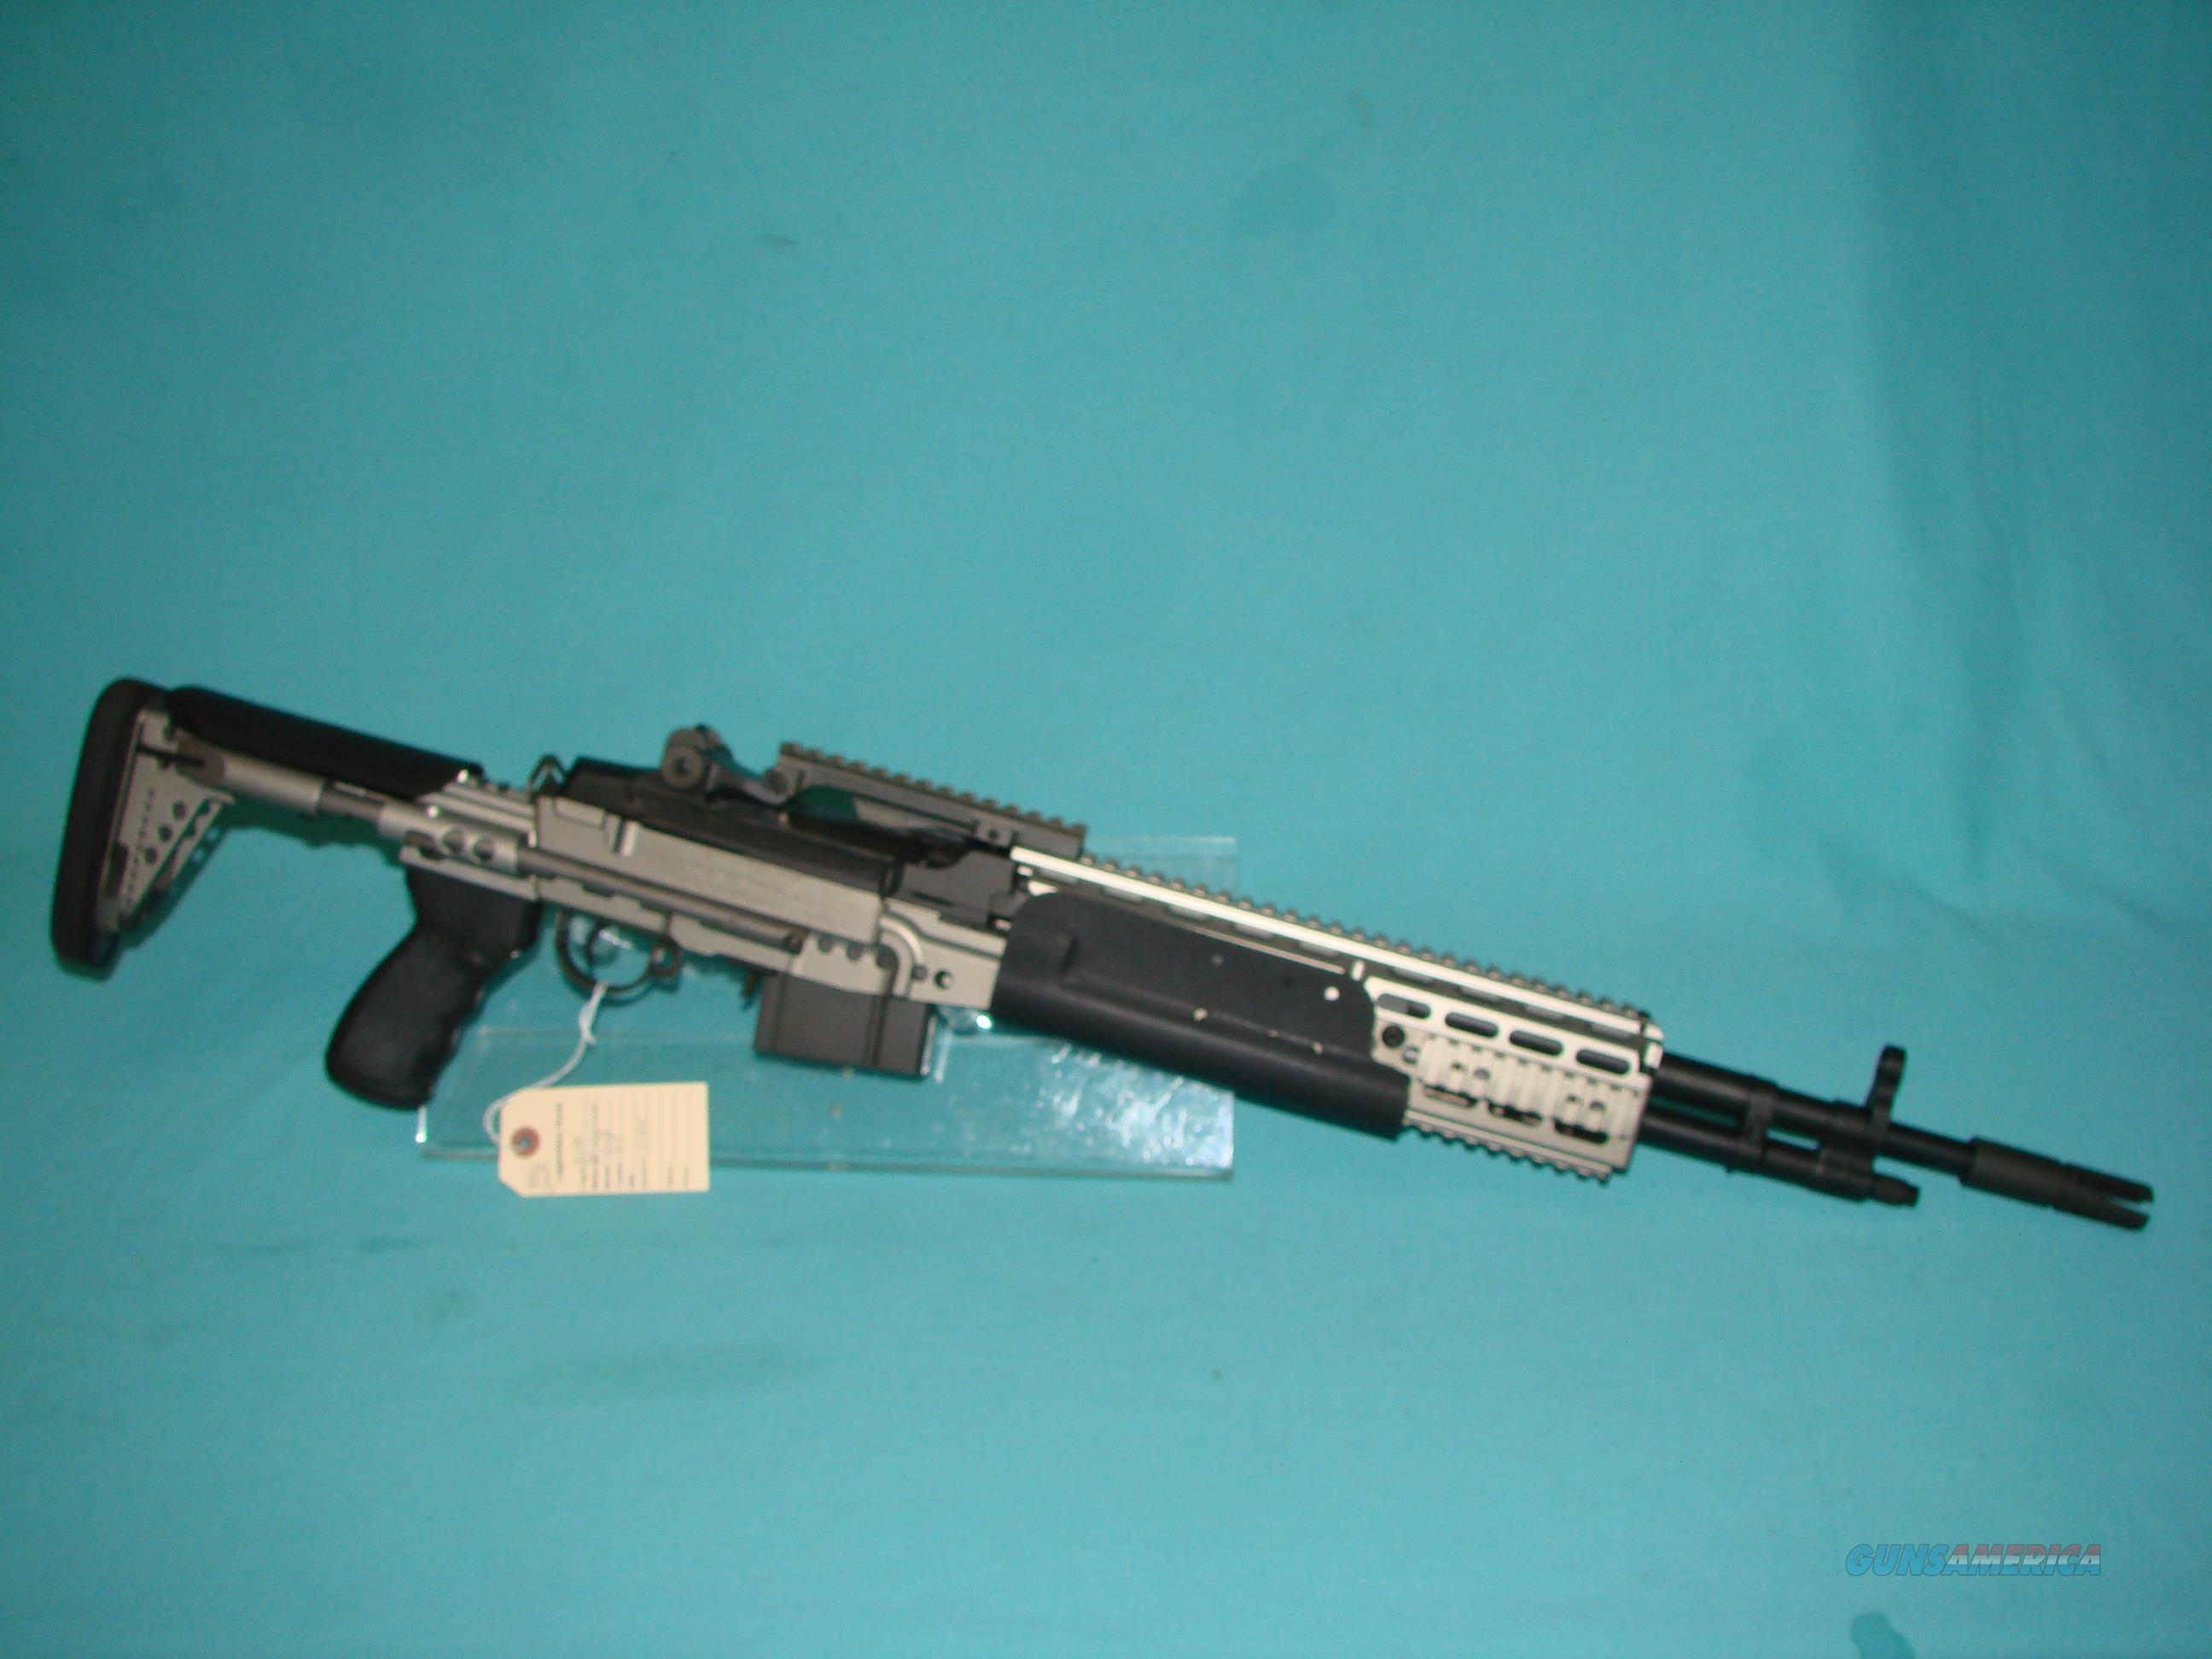 Springfield M1A Custom  Guns > Rifles > Springfield Armory Rifles > M1A/M14